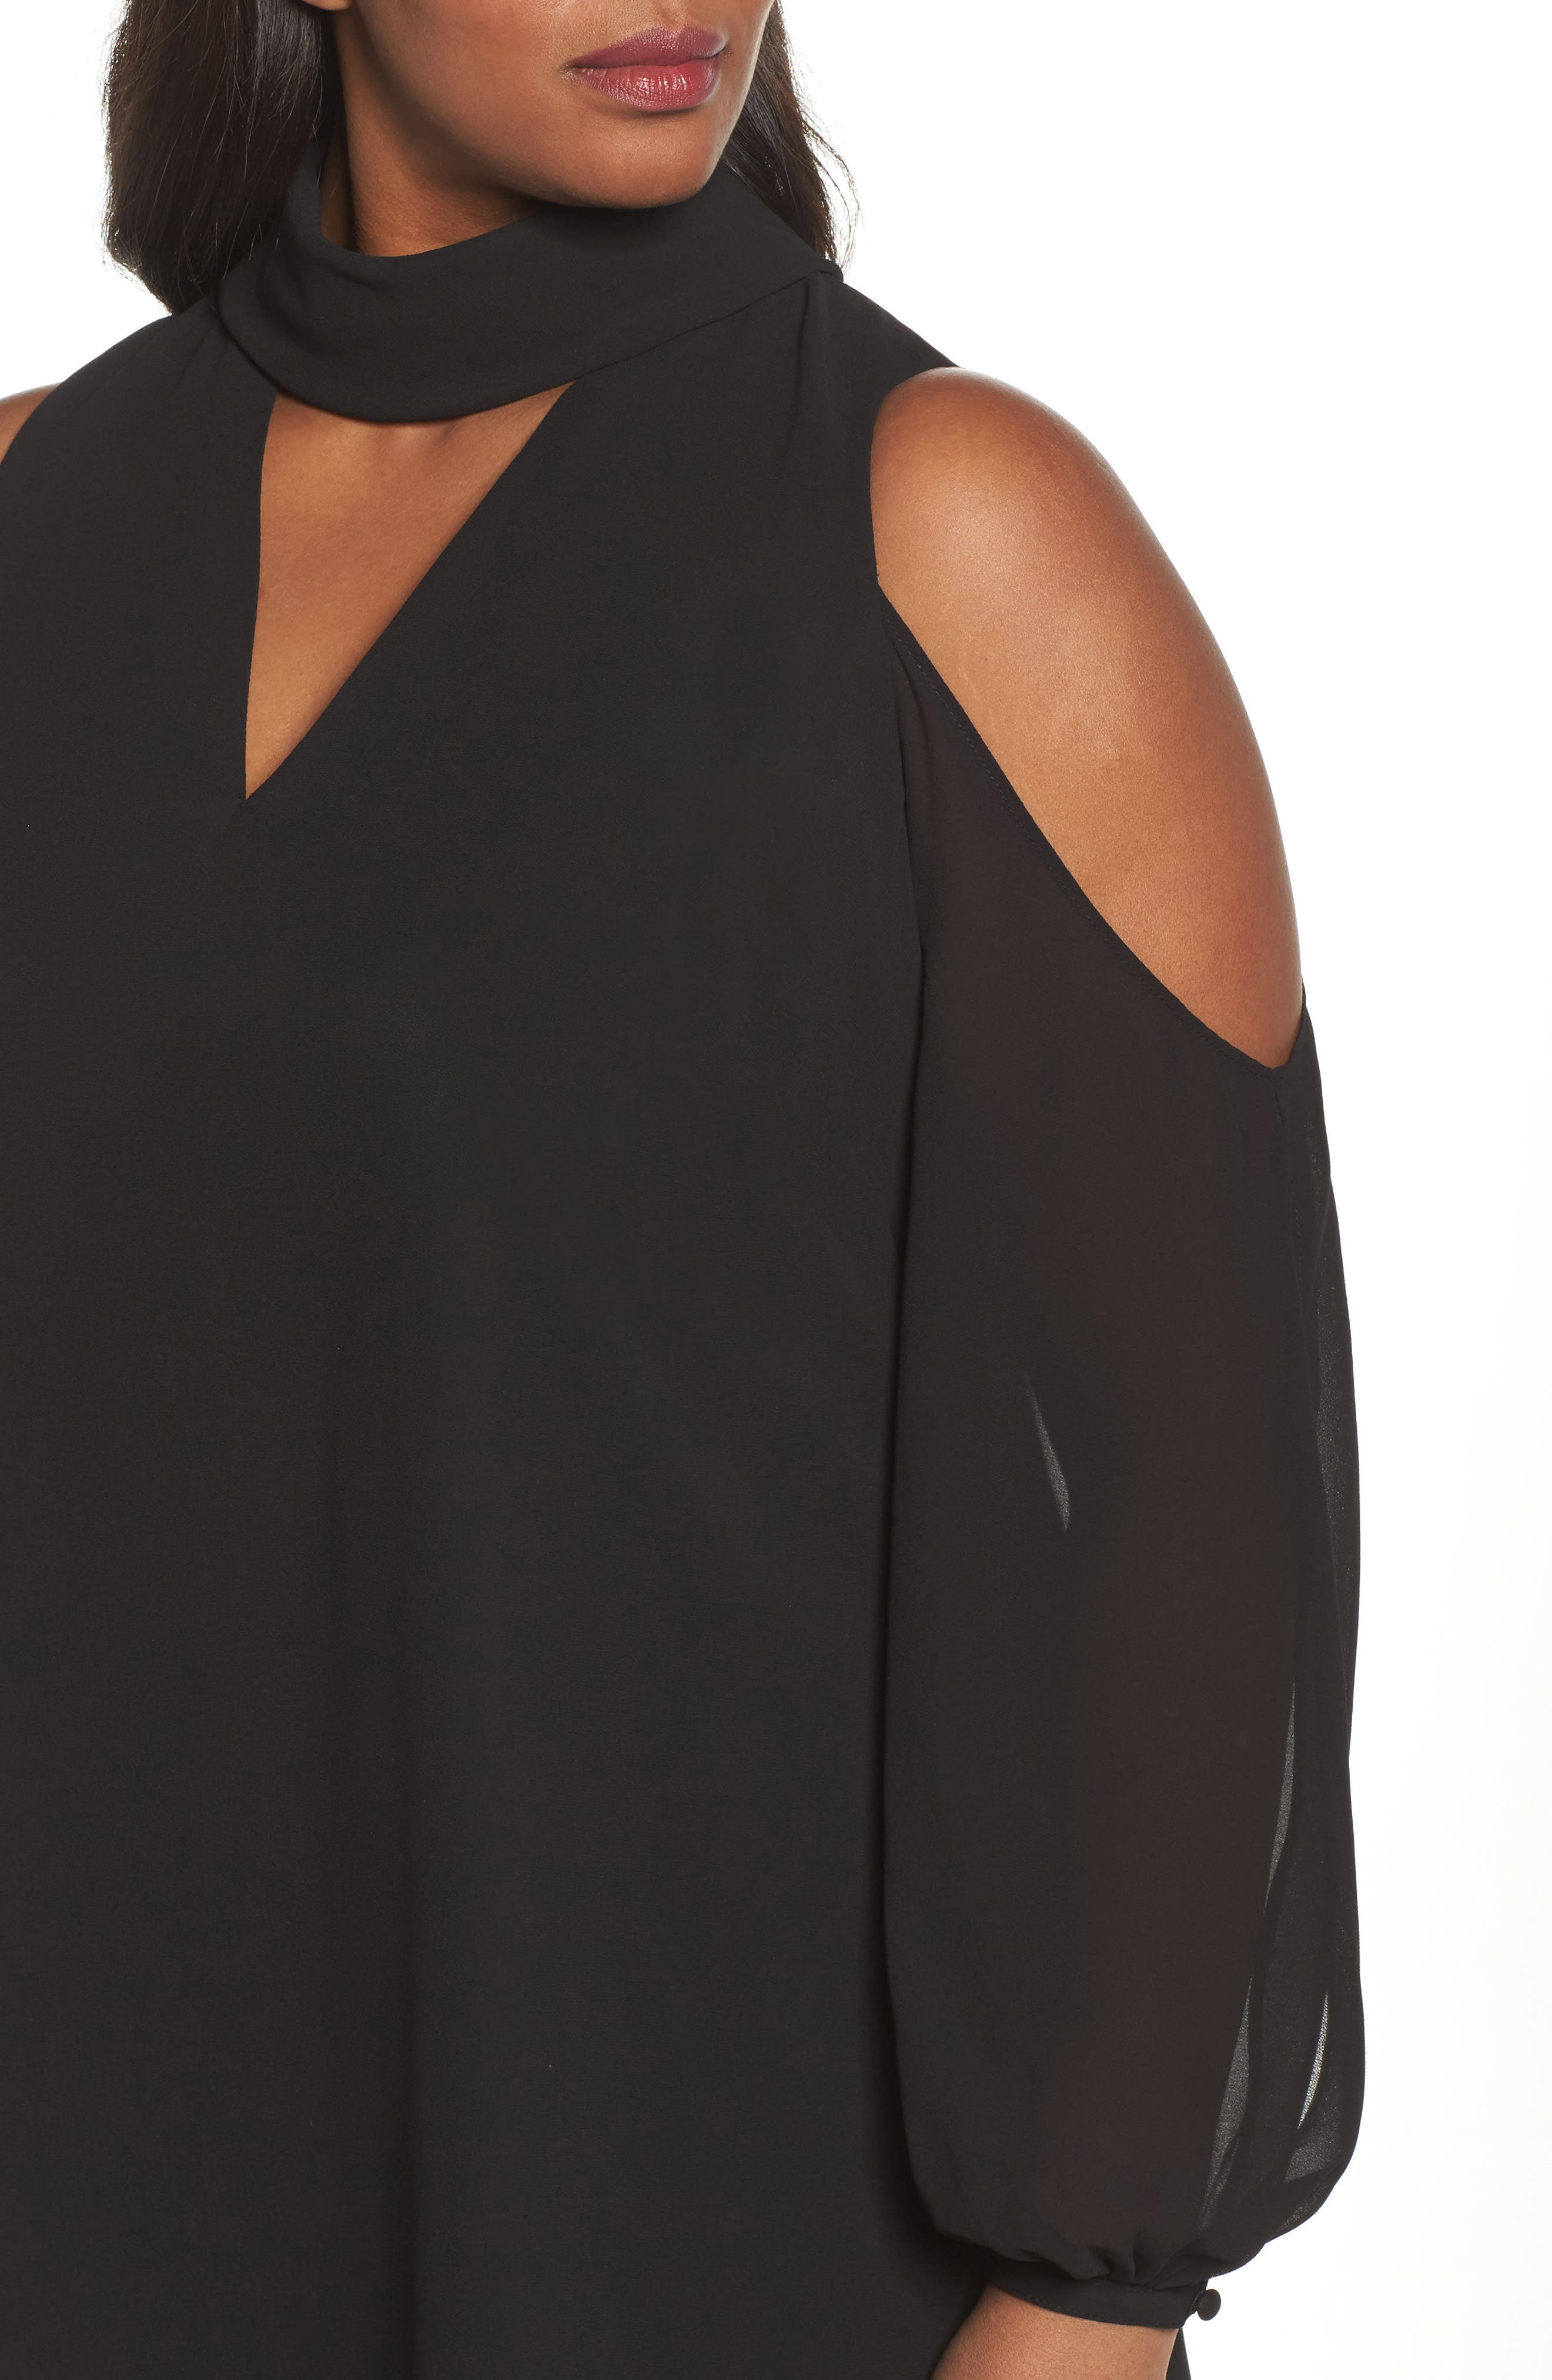 Choker Chiffon Dress,                             Alternate thumbnail 4, color,                             Black